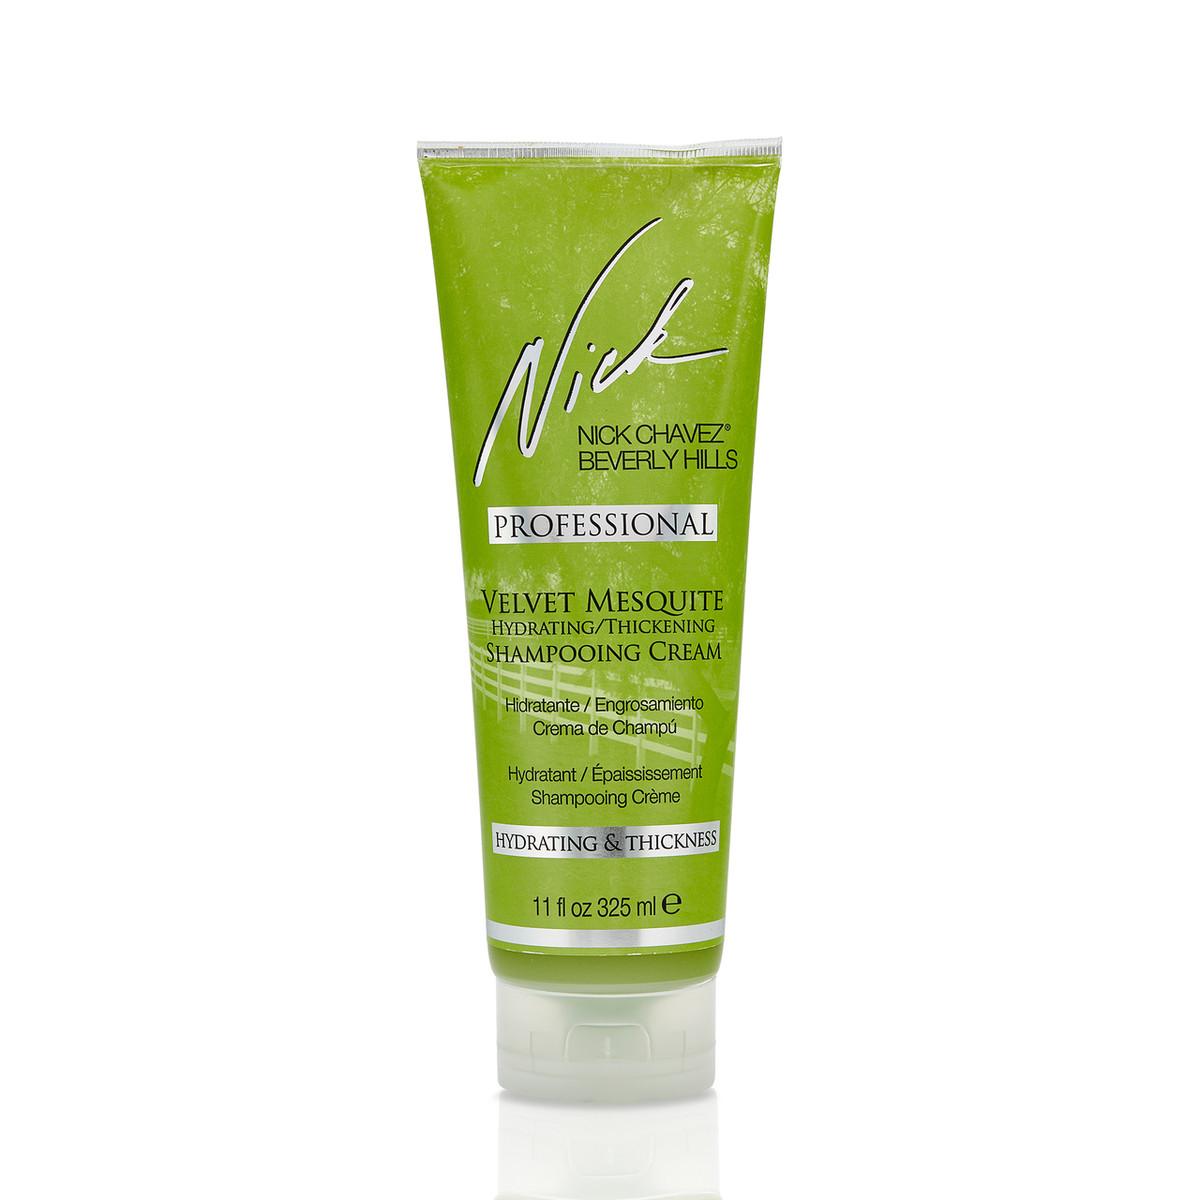 Velvet Mesquite Hydrating Thickening Shampooing Creme 12oz